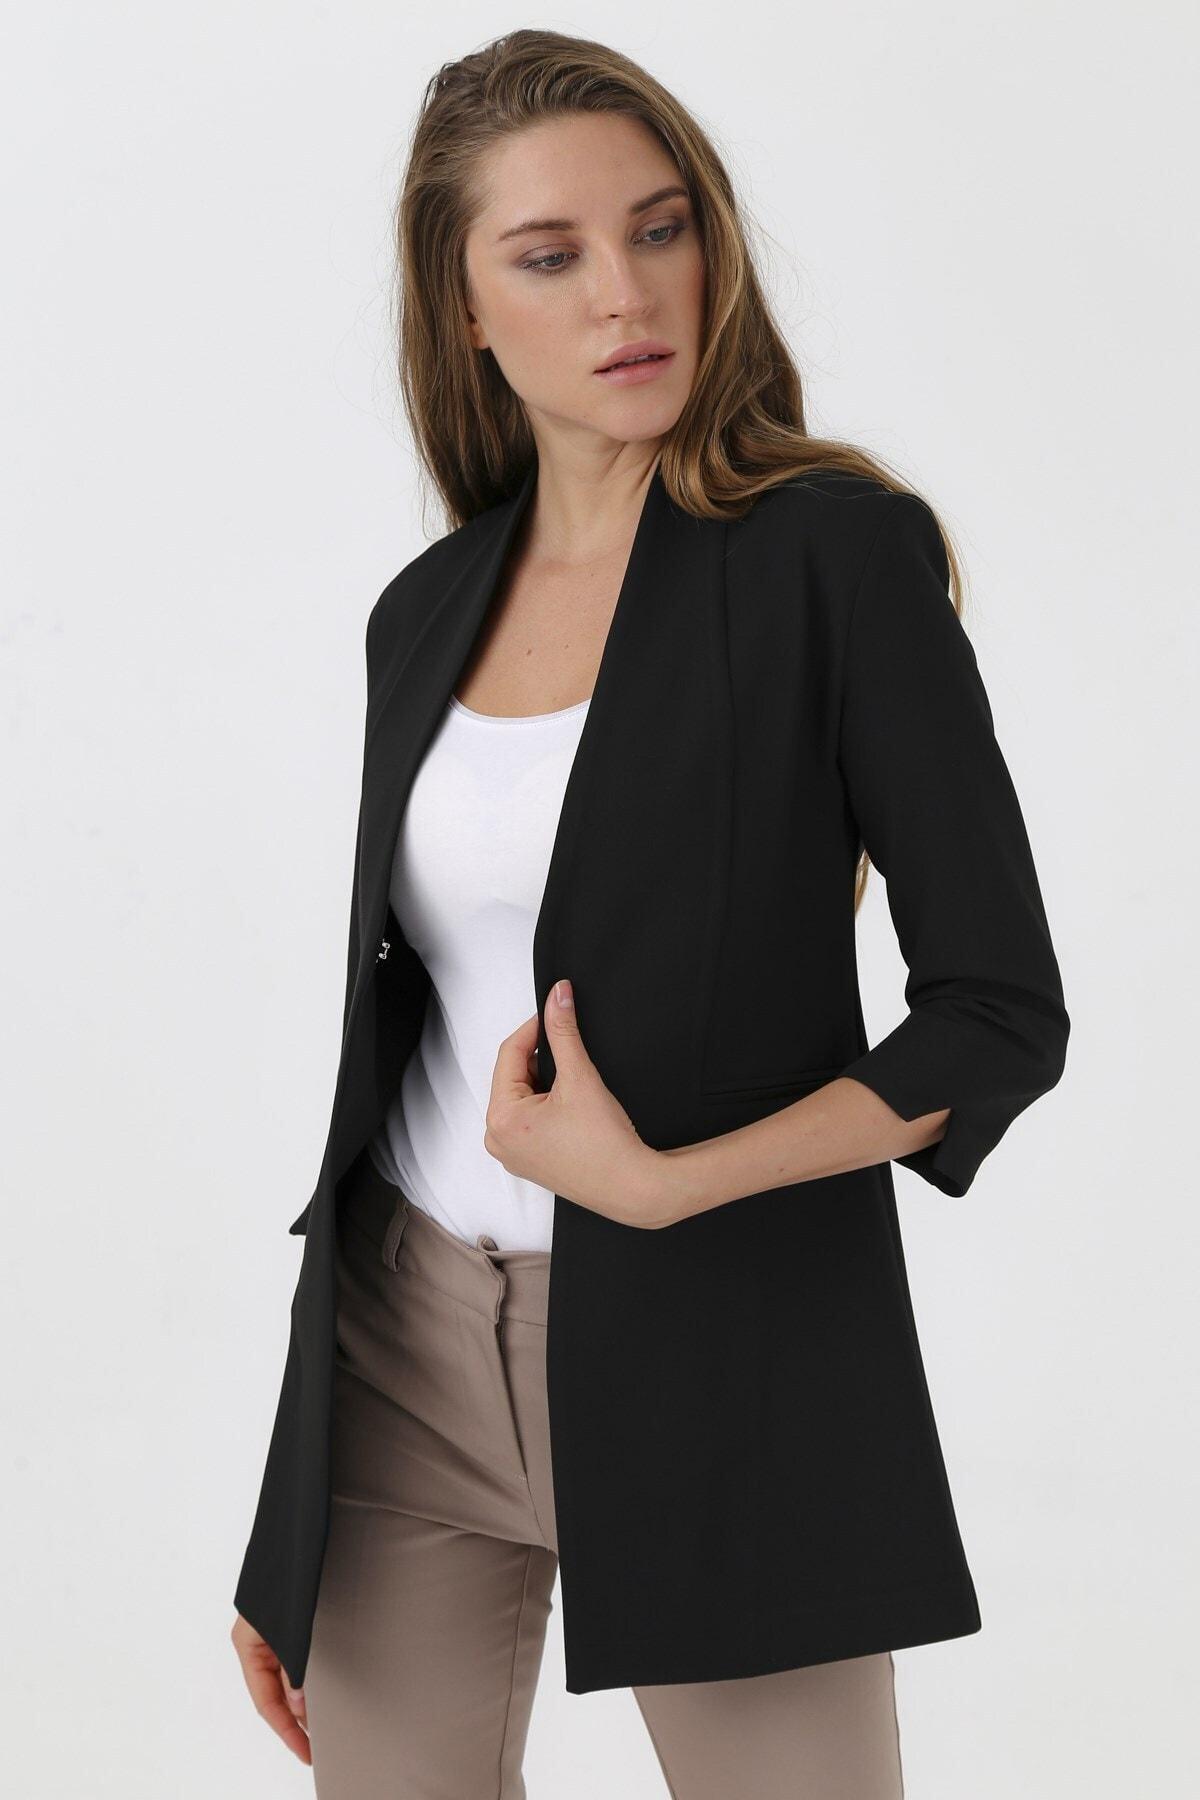 Hakim Yaka Flato Cepli Kolu Yırtmaçlı Uzun Blazer Kumaş Ceket-siyah